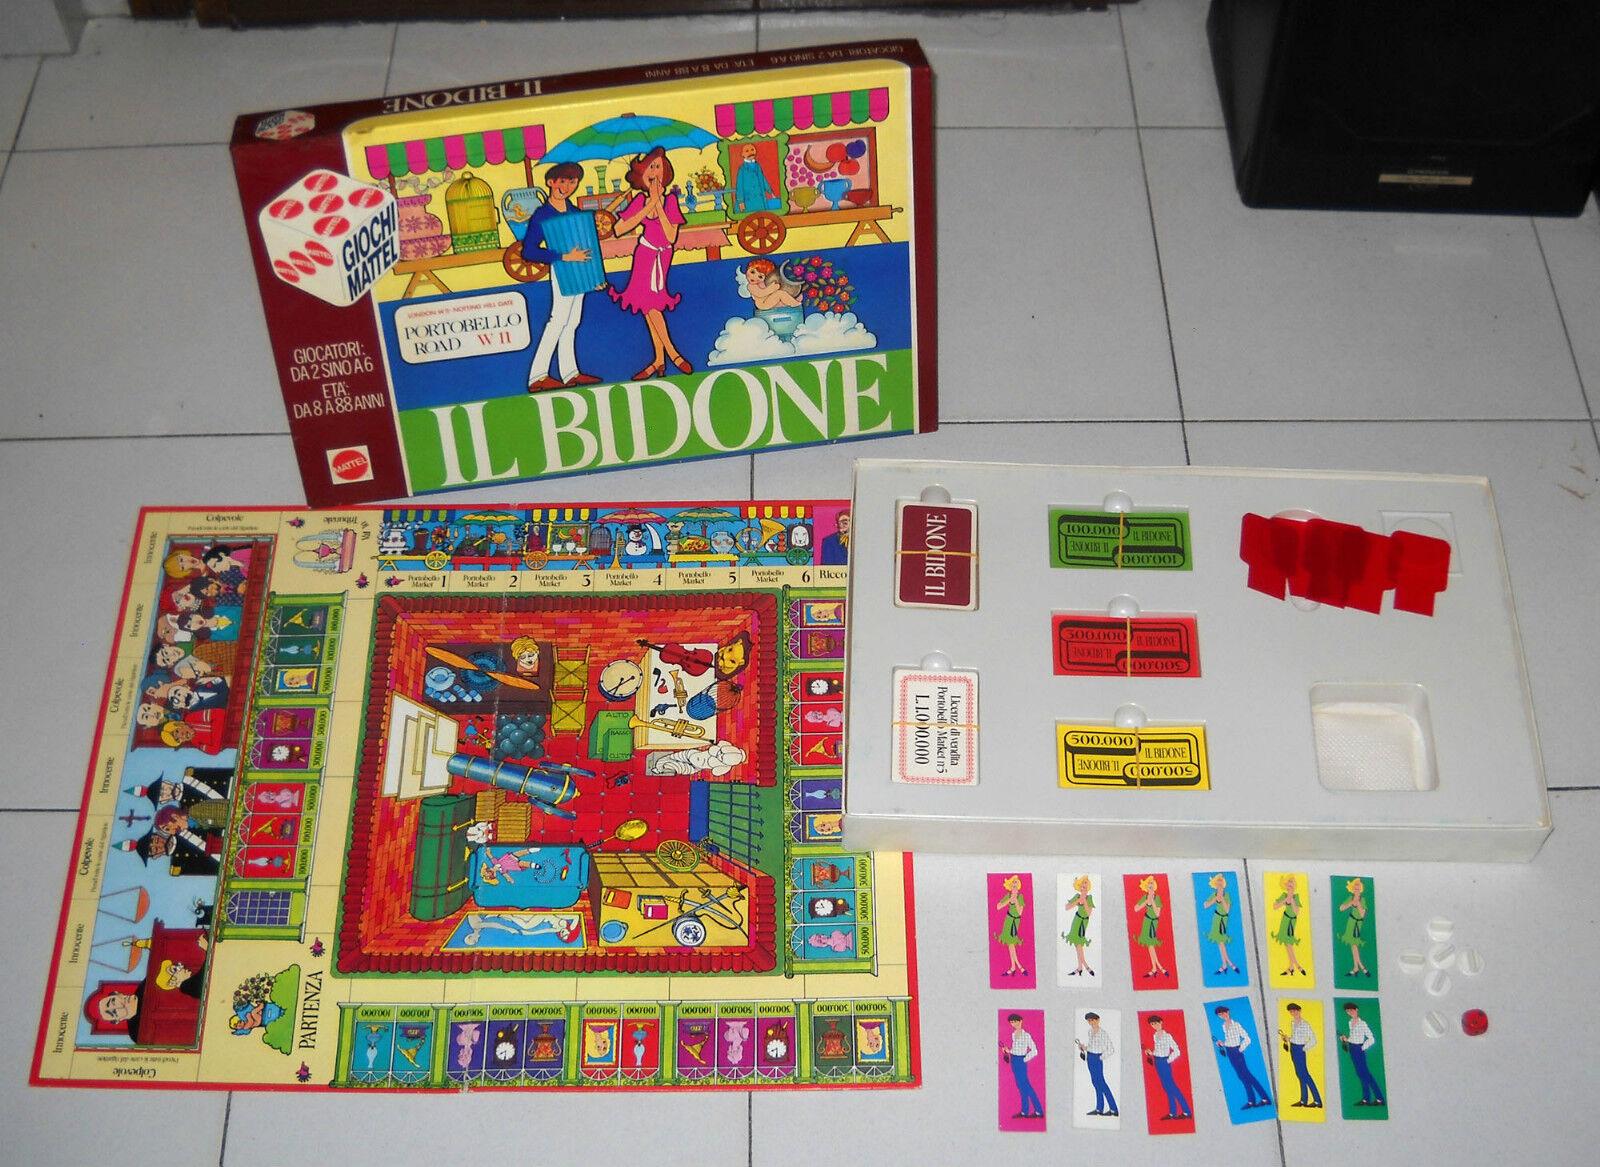 Le bin- Mattel Jeux Années 80 Portobello Road W11